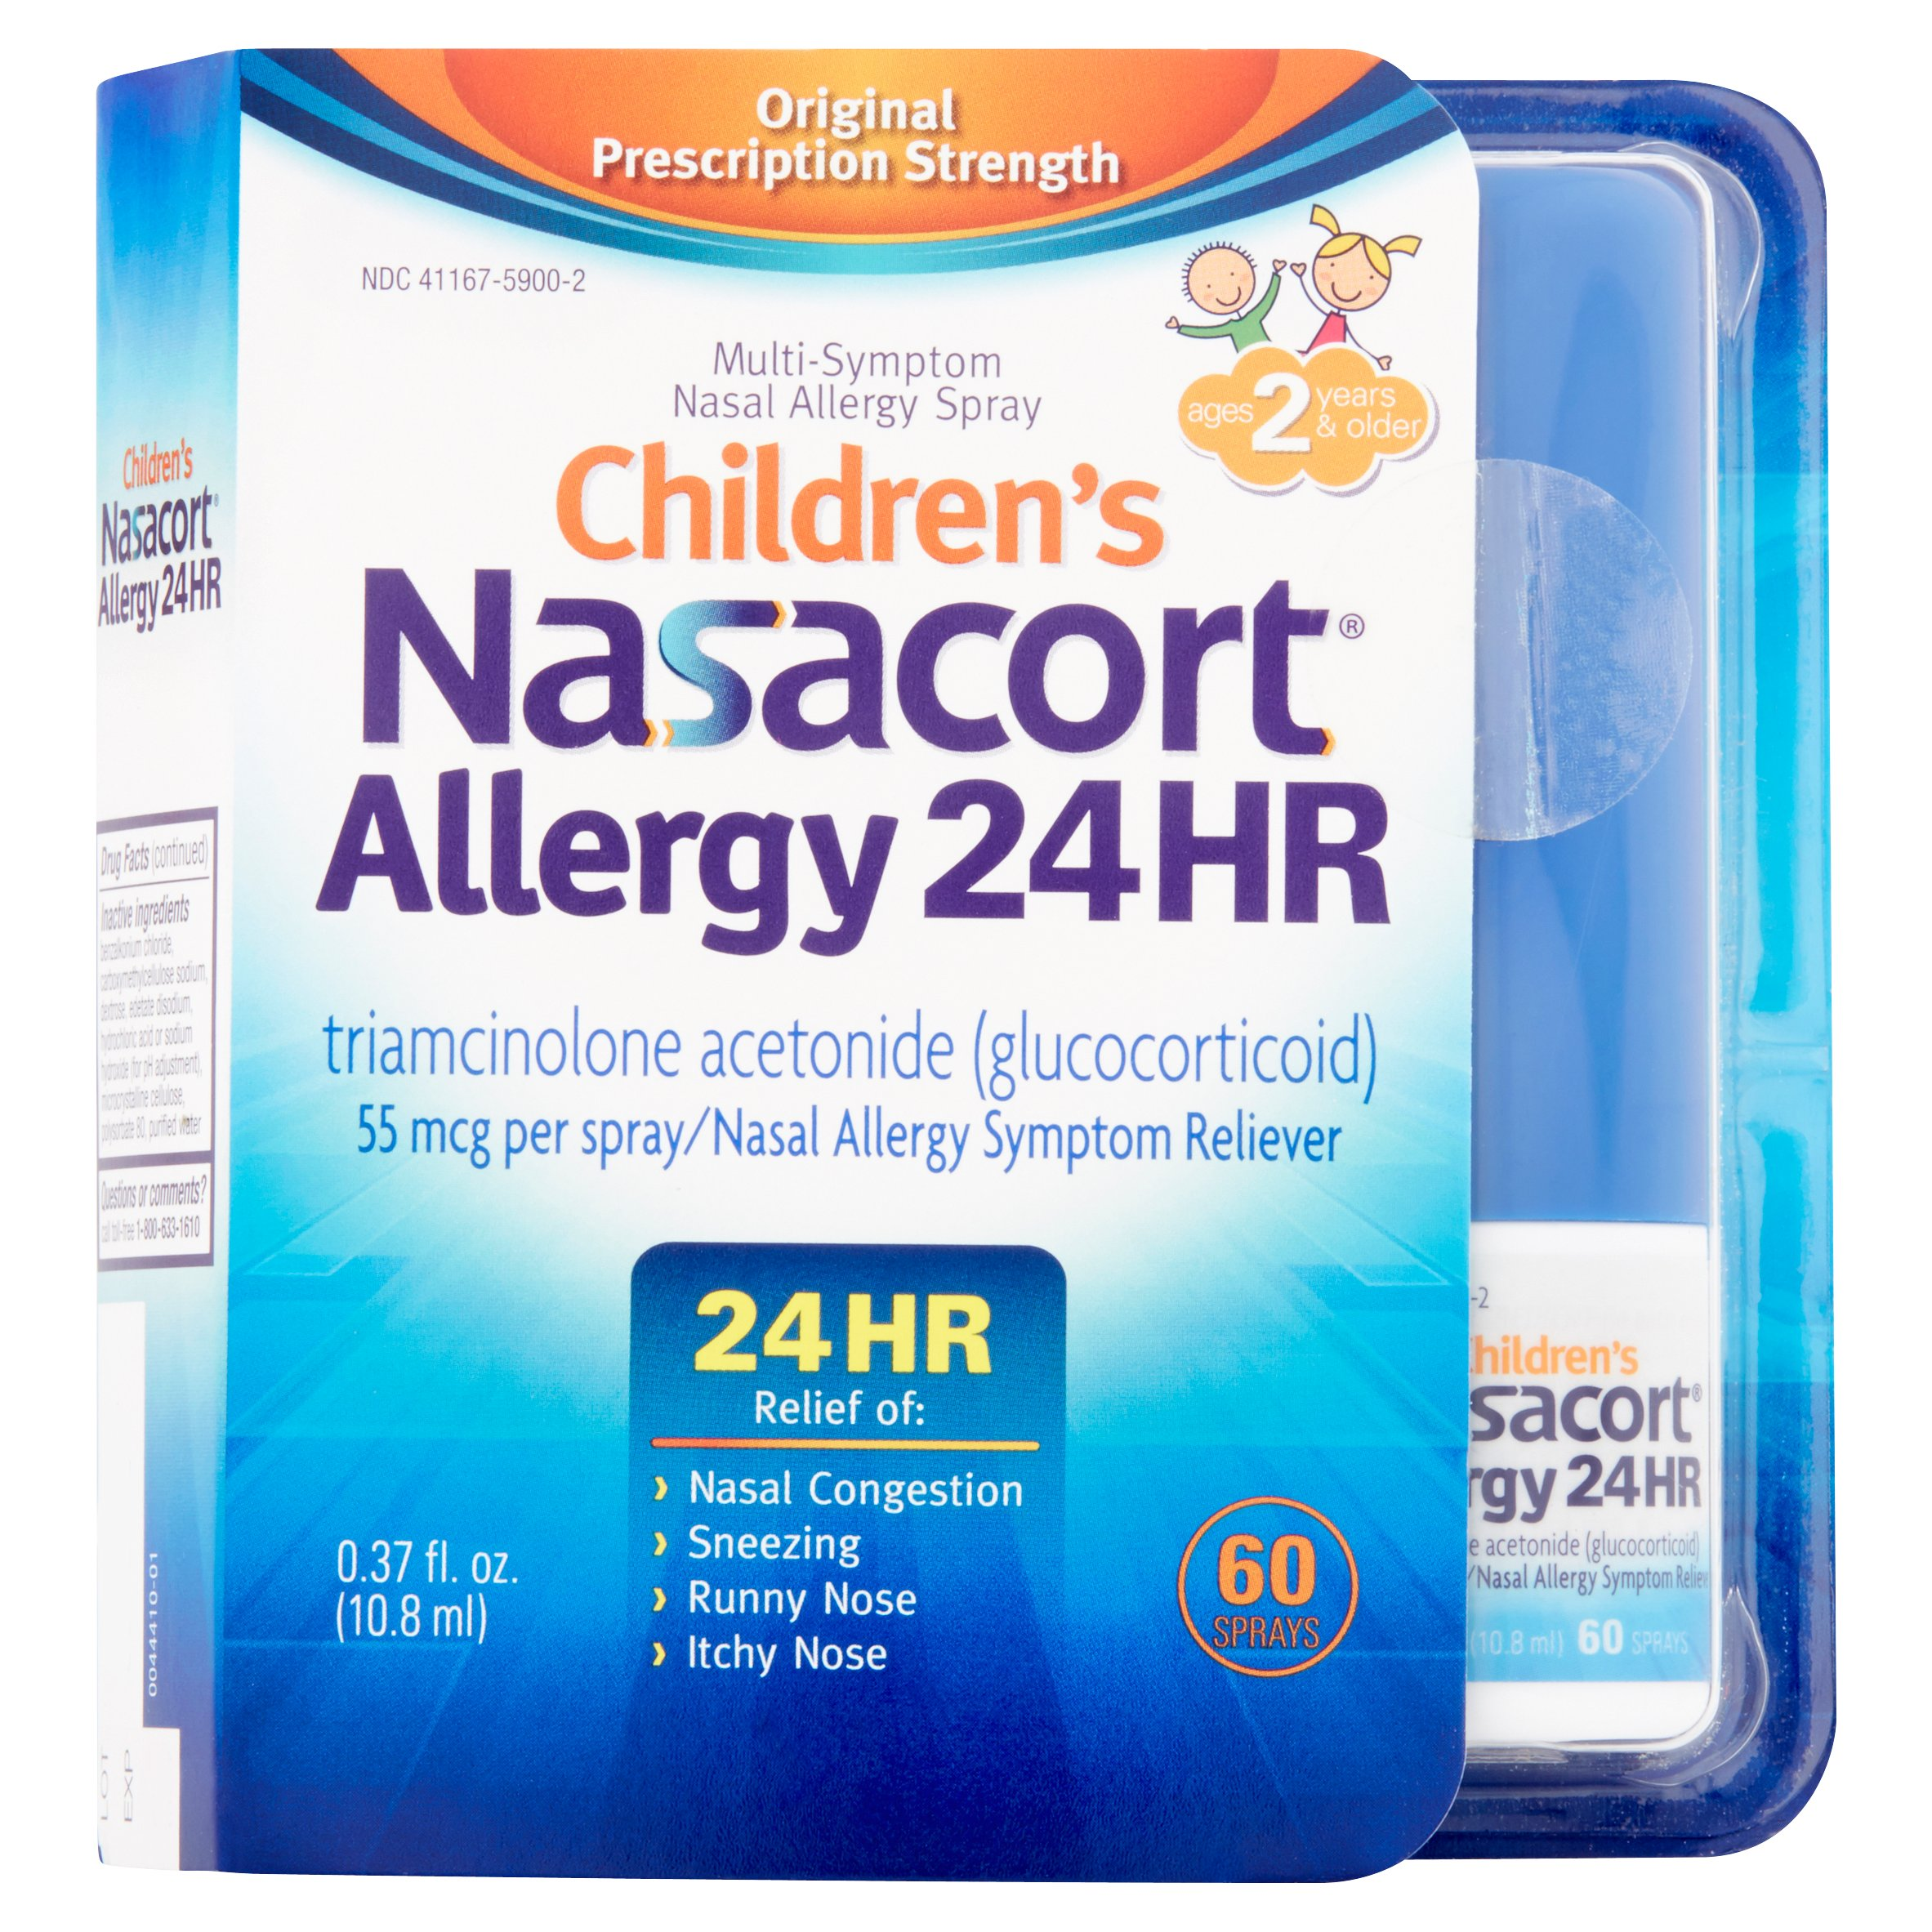 Childrens Nasacort